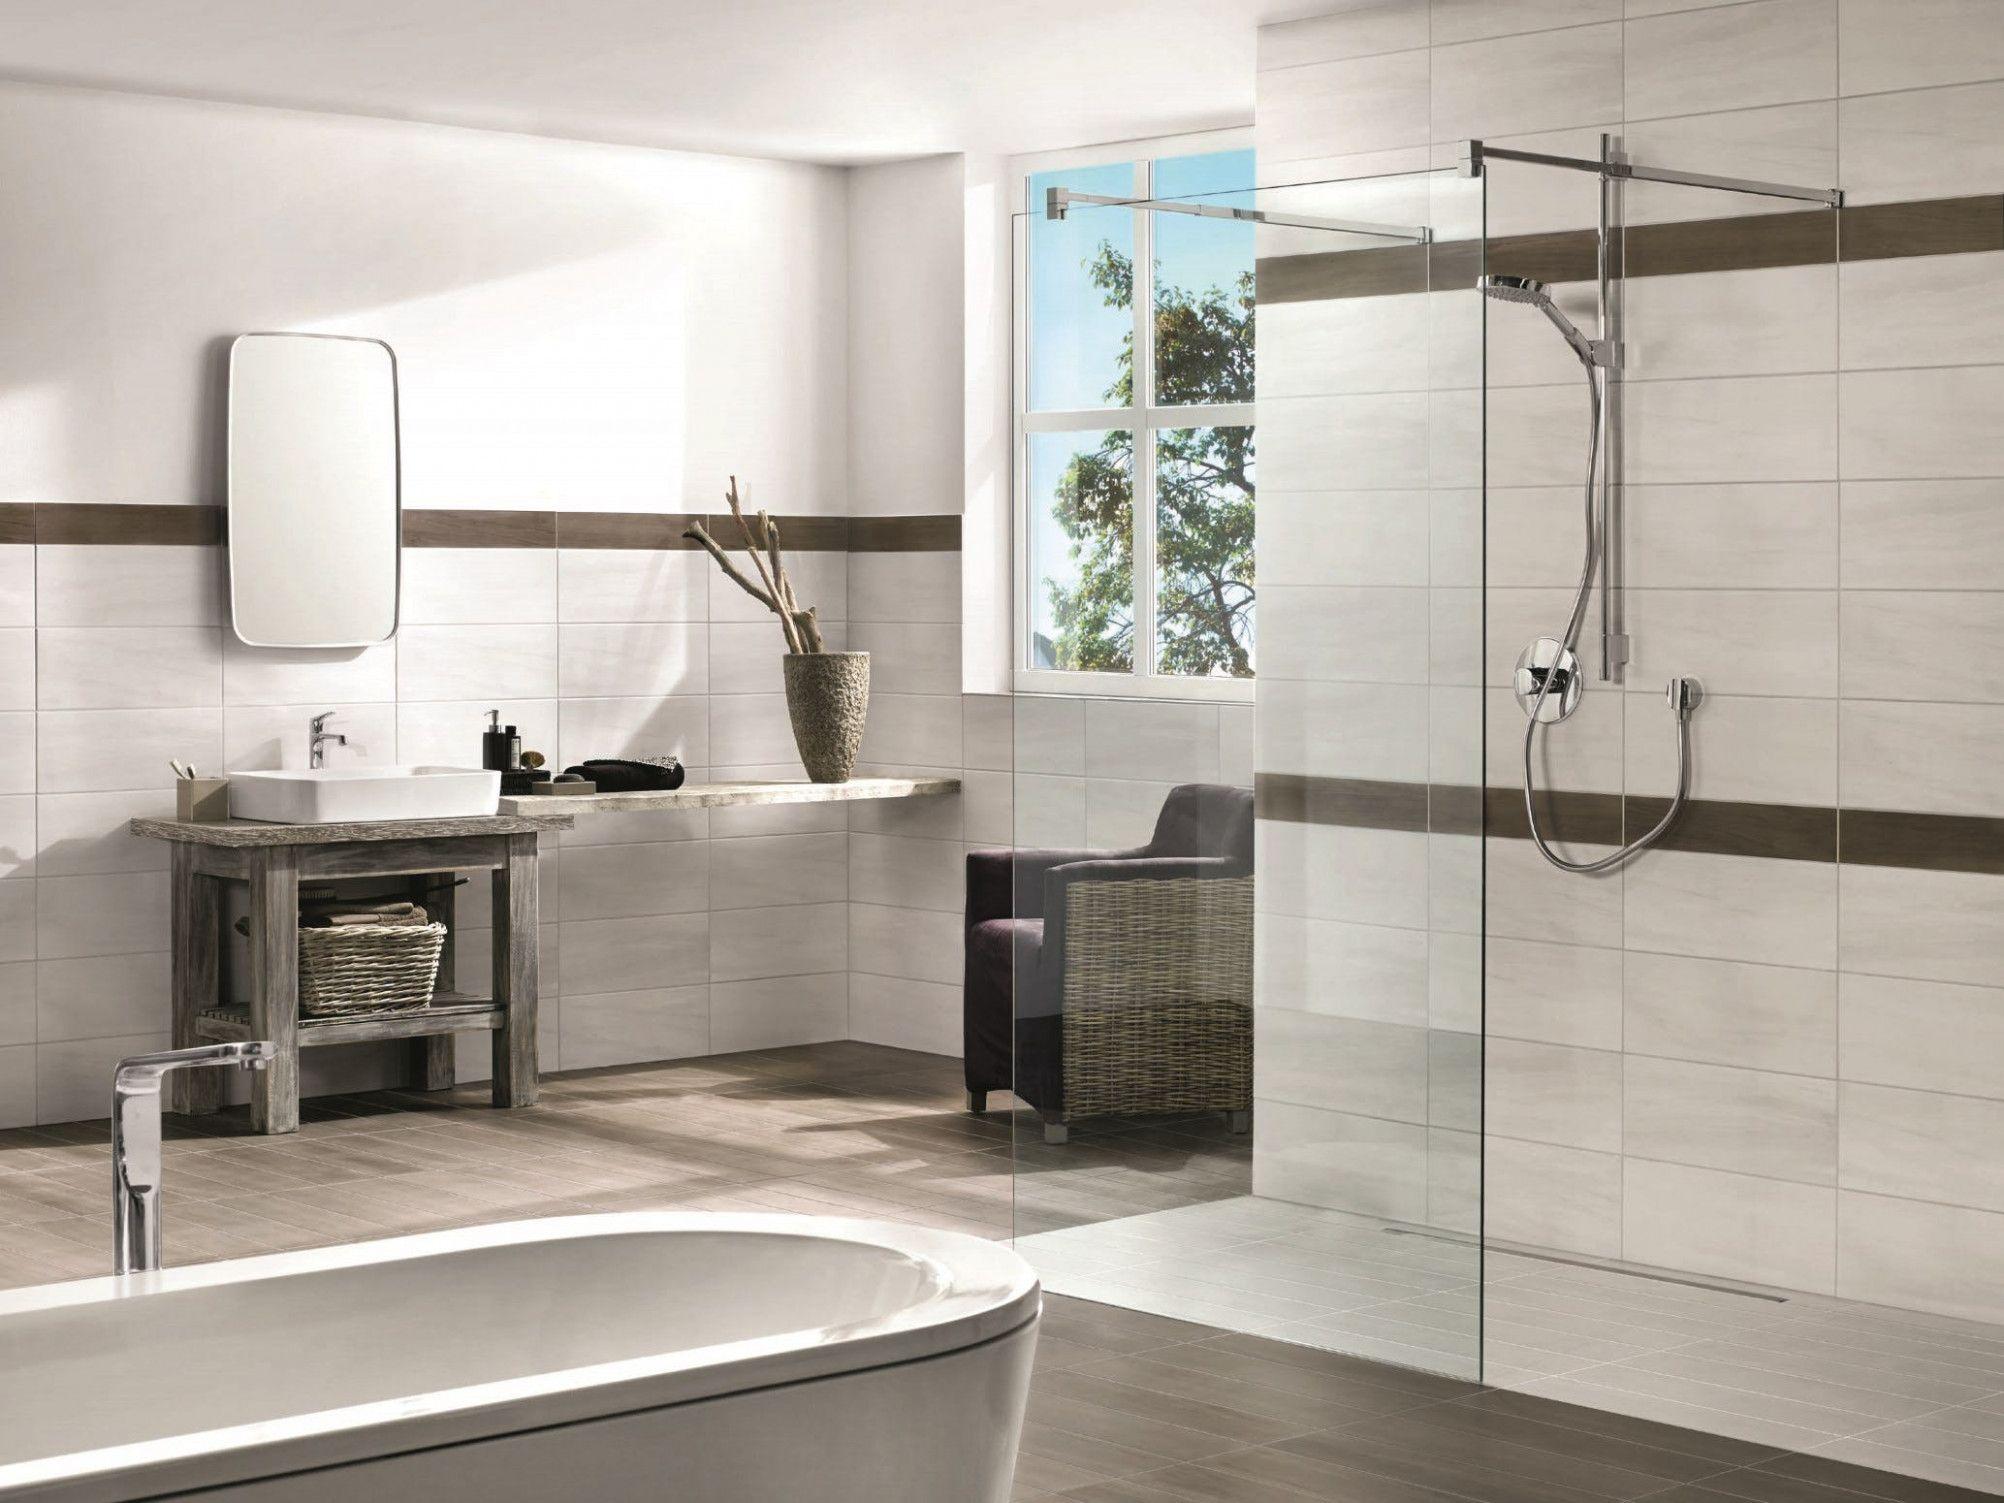 10 Arbeits Ideen Obi In 2020 Bad Modernisieren Badezimmerideen Badezimmereinrichtung